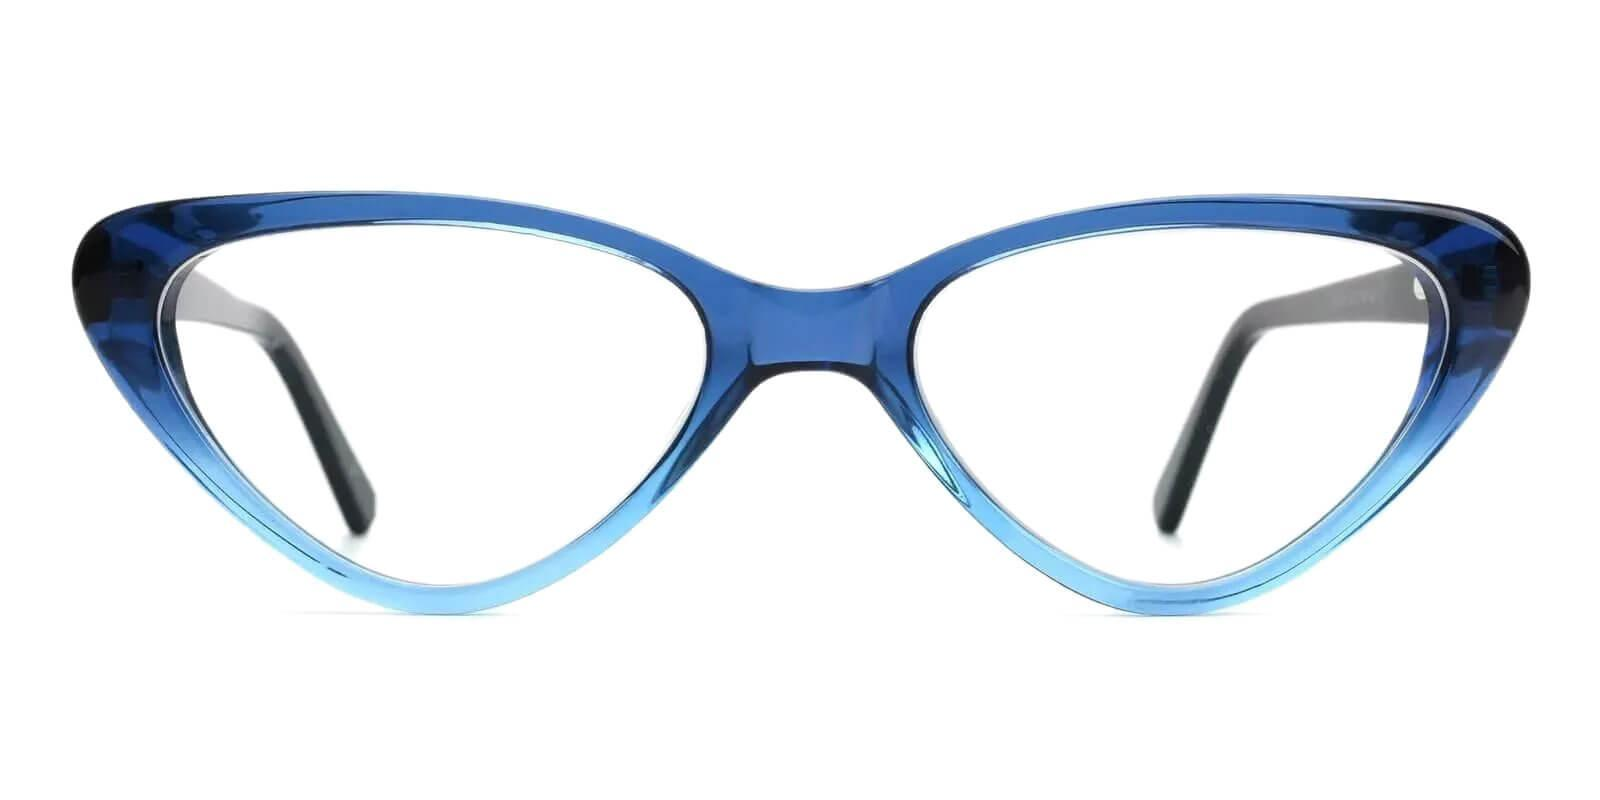 Selina Blue Acetate Eyeglasses , SpringHinges , UniversalBridgeFit Frames from ABBE Glasses